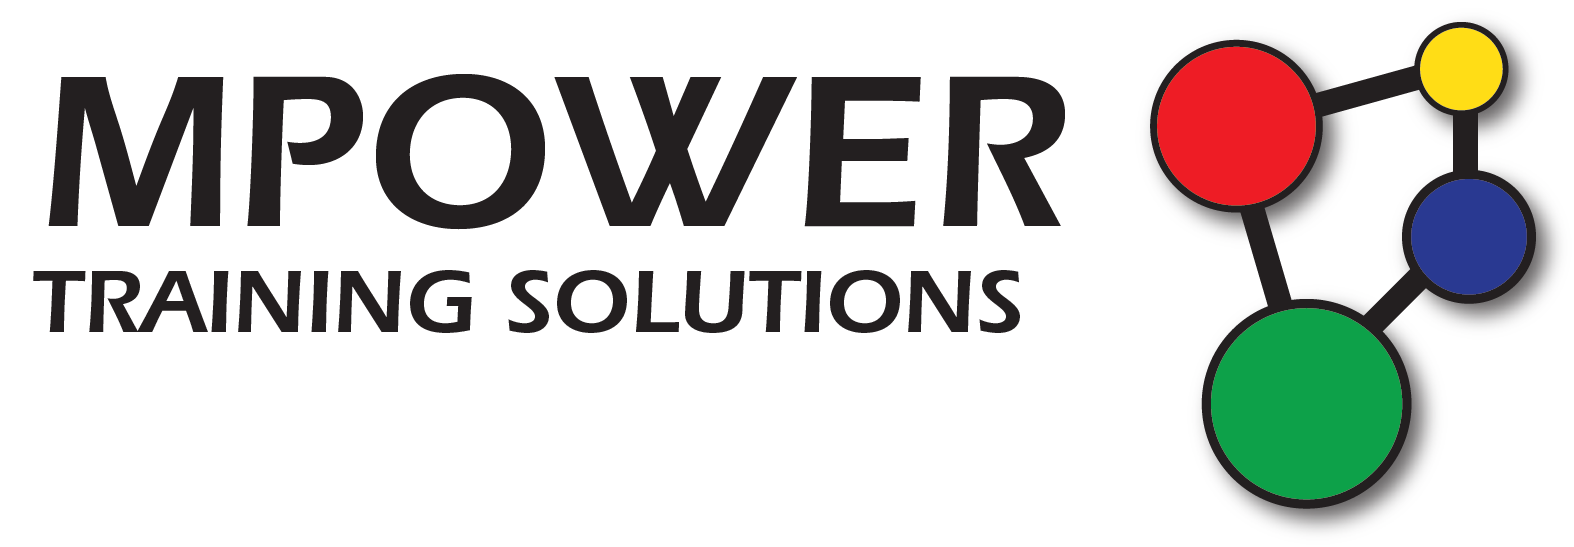 JOB Logo mpower